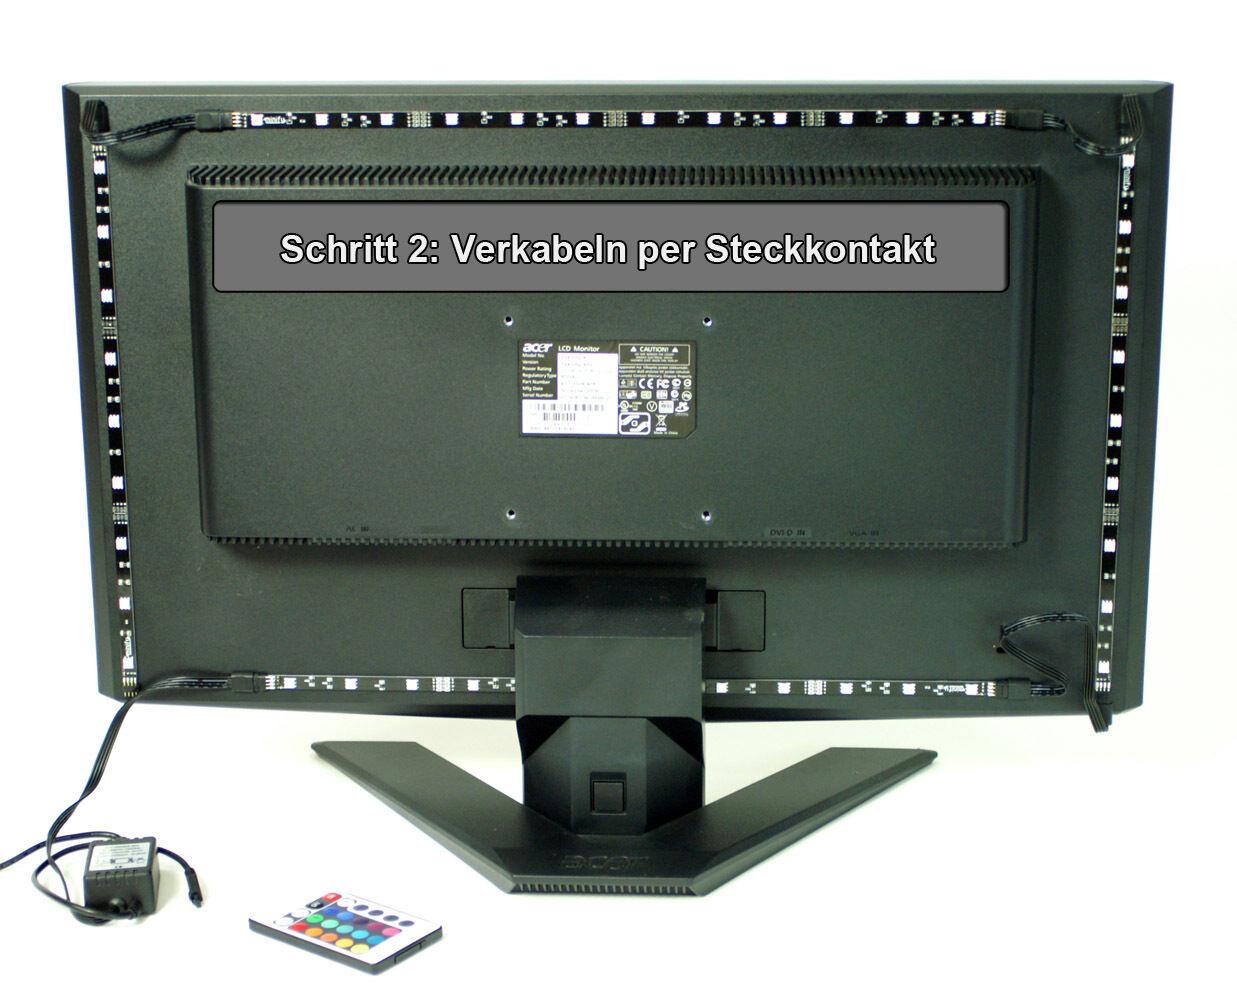 TV HINTERGRUNDBELEUCHTUNG 24-60 24-60 24-60 ZOLL (61-152cm)   LED LEISTE STRIP   MIT FB + NT 911b49